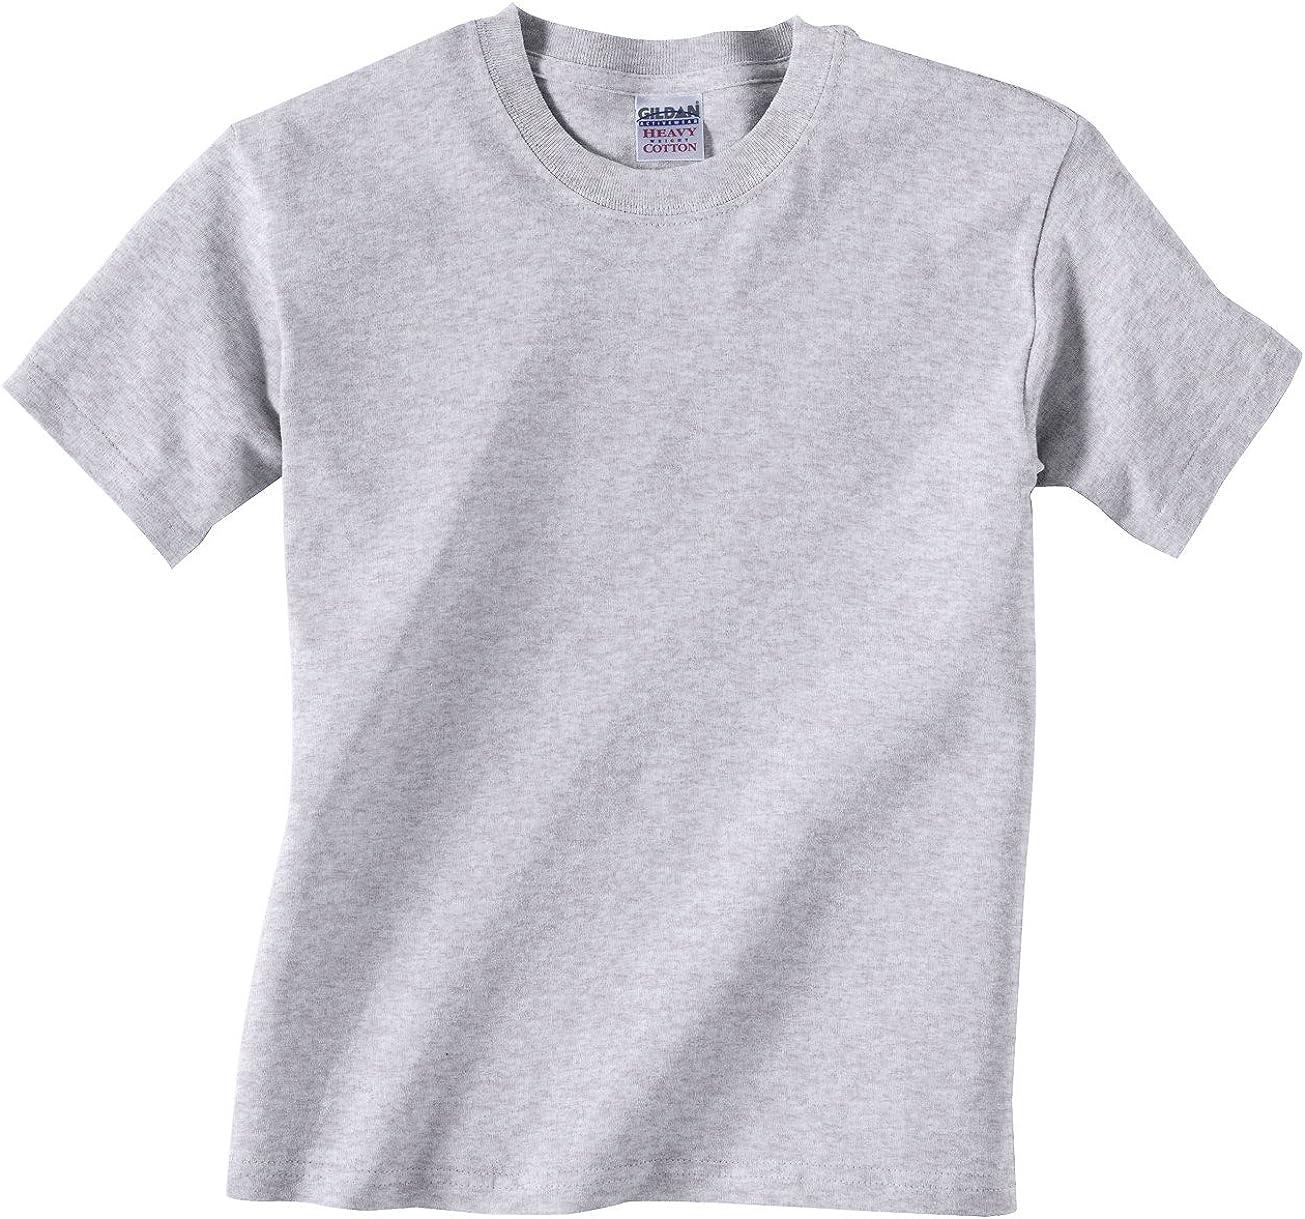 Gildan Youth 5.3 oz. Heavy Cotton T-Shirt, Ash, X-Large